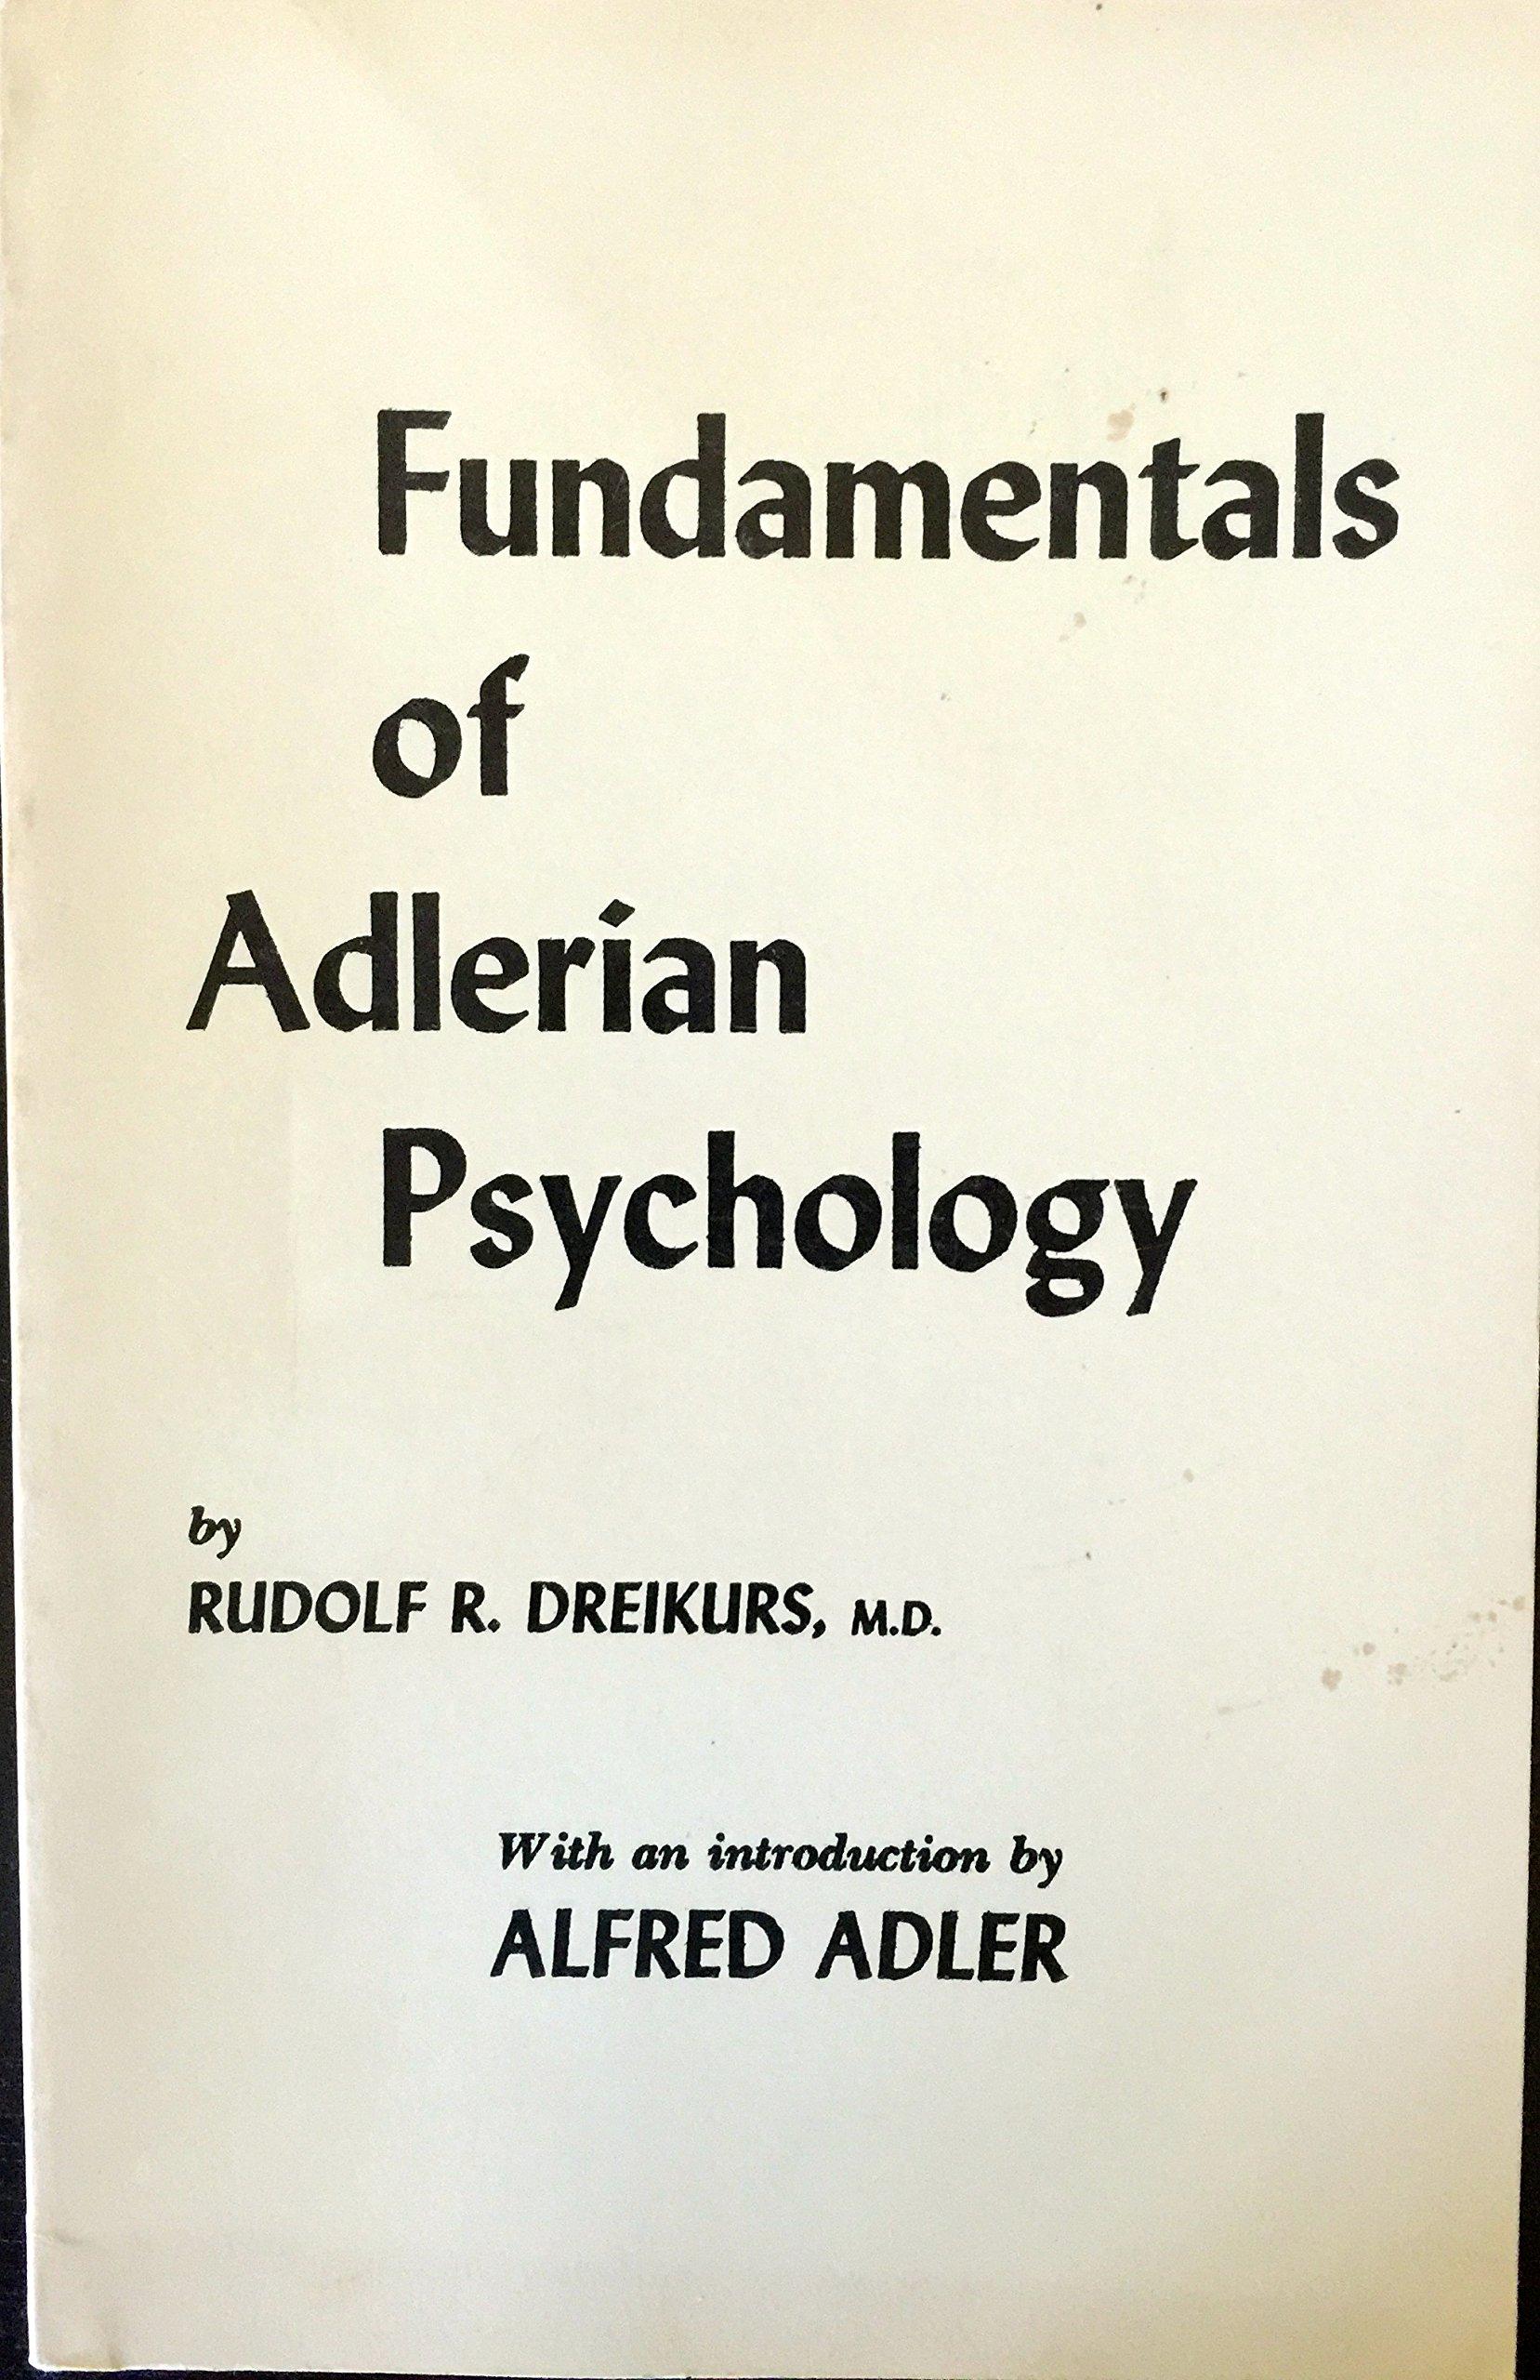 Fundamentals of Adlerian psychology: Alfred Adler, Rudolf R. Dreikurs:  9780918560087: Amazon.com: Books